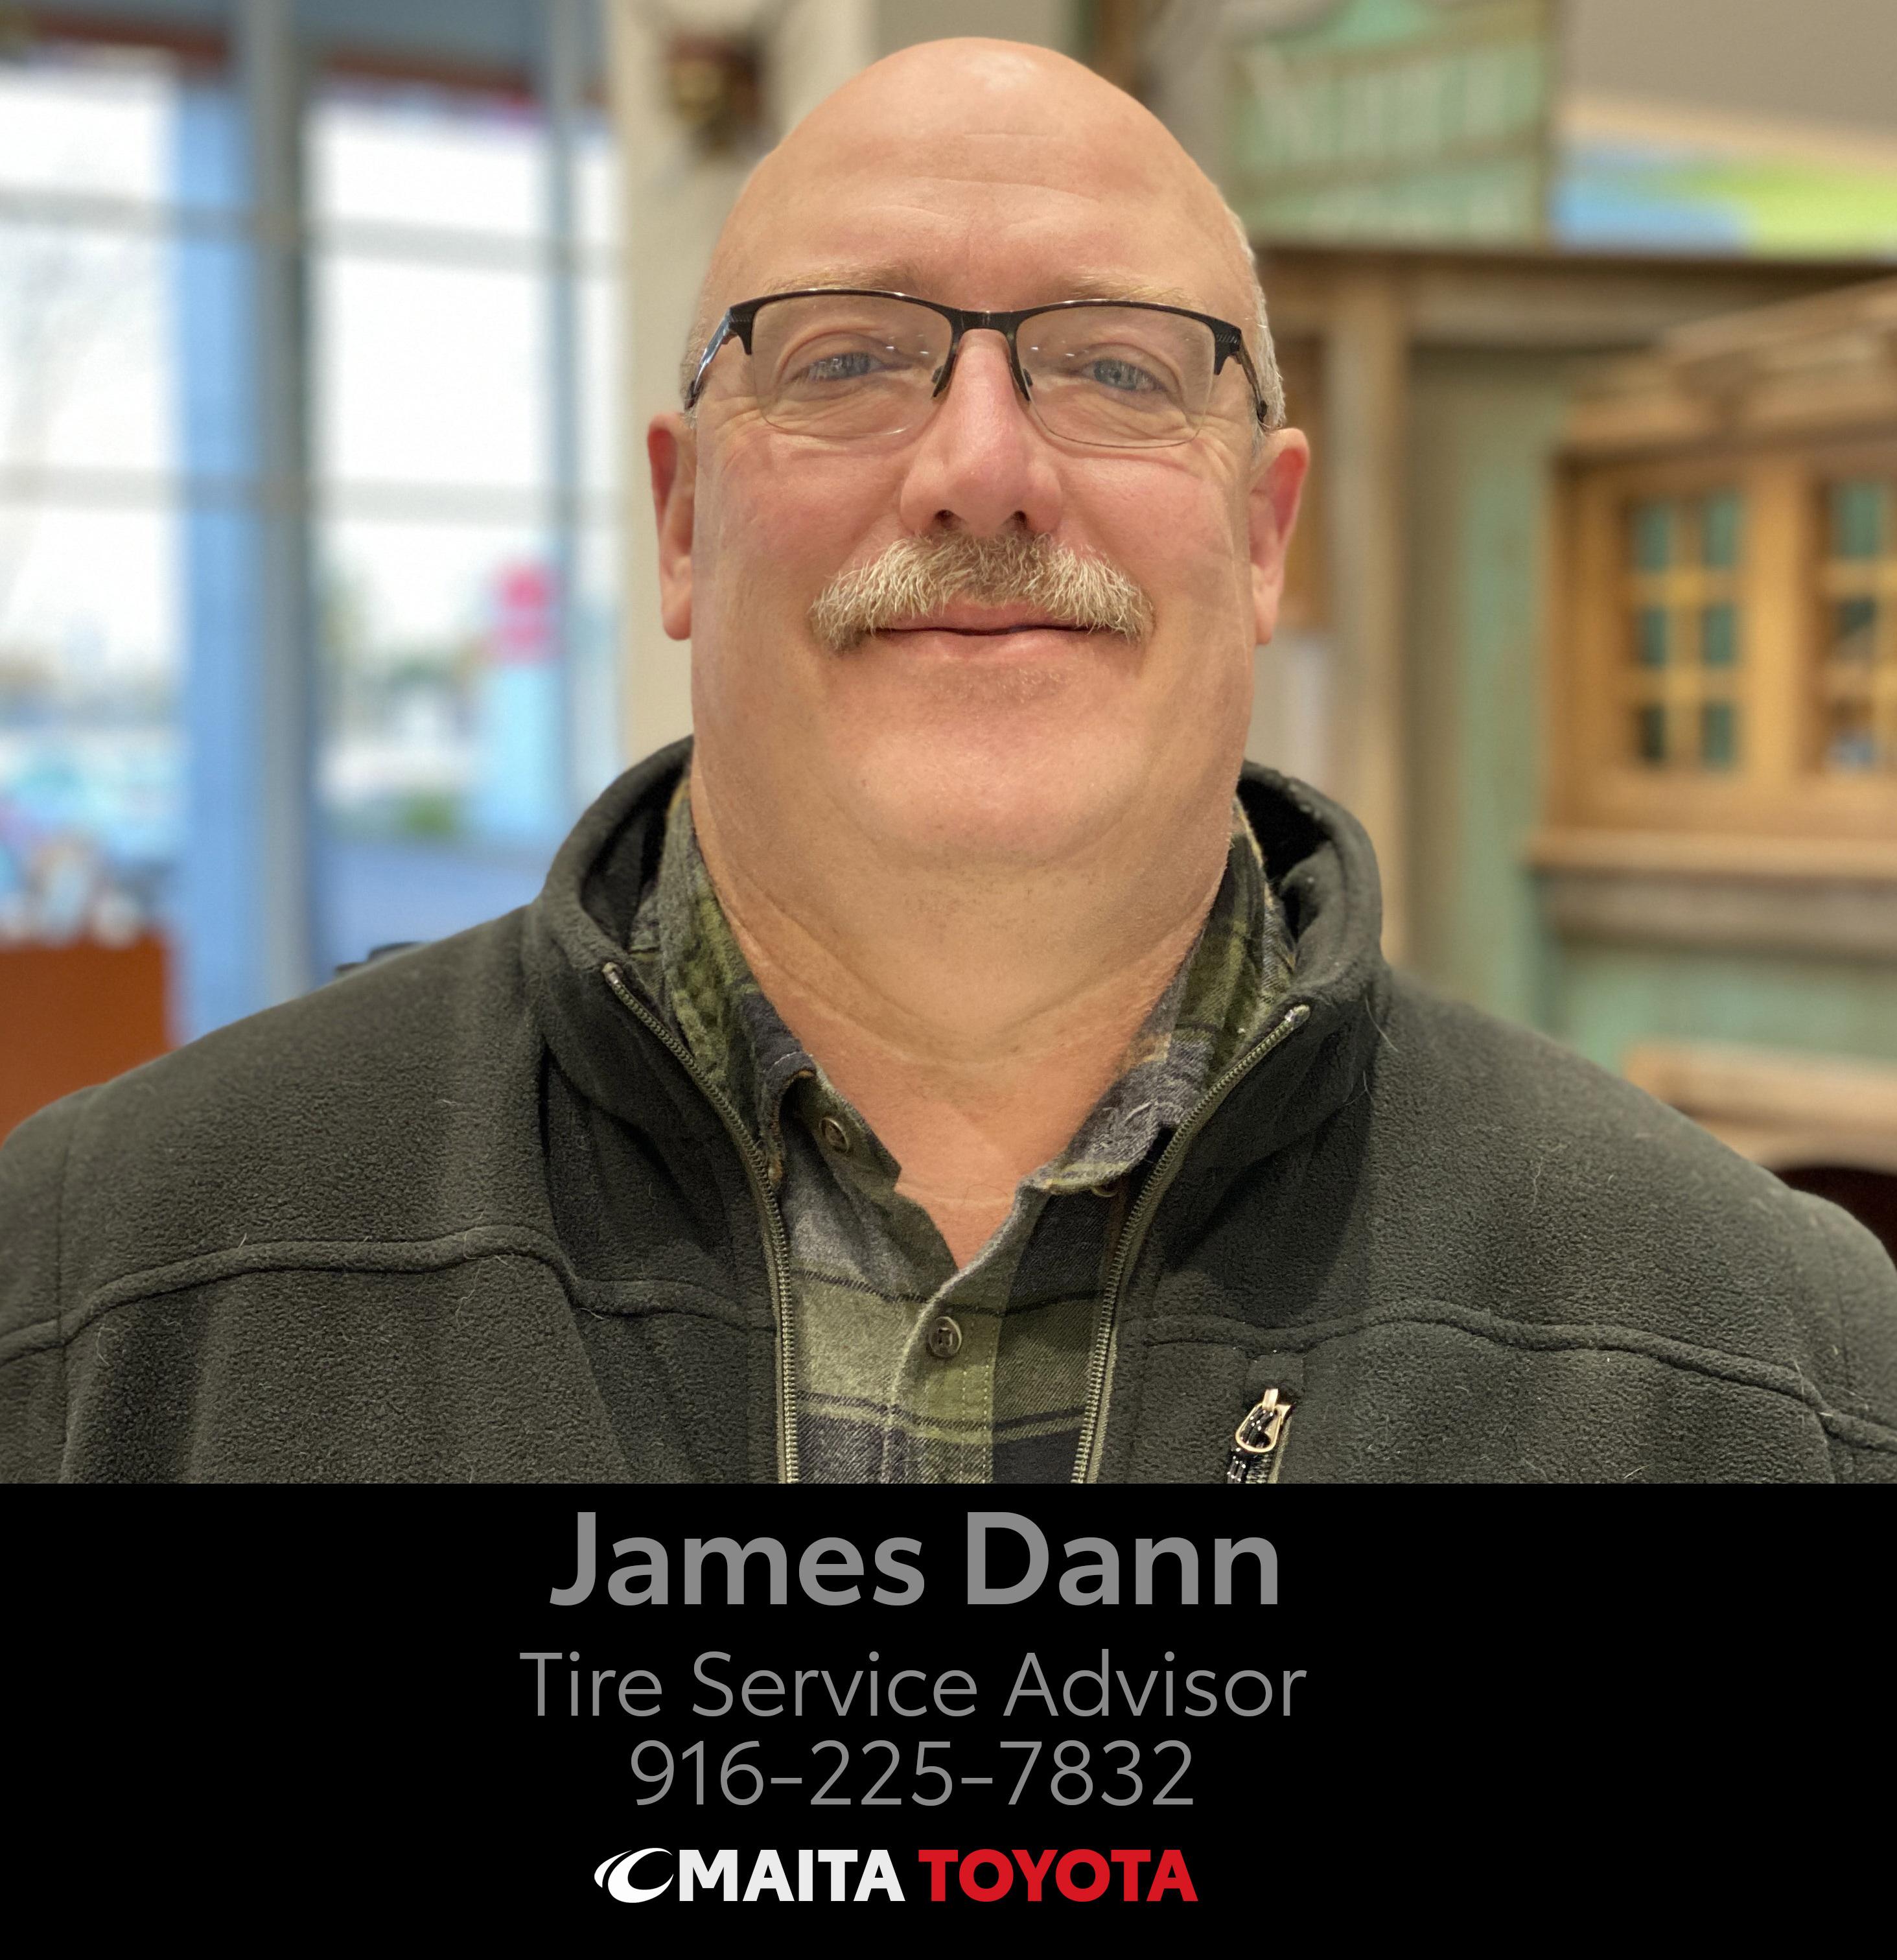 James Dann, Tire Service Advisor. Call 916-225-7832